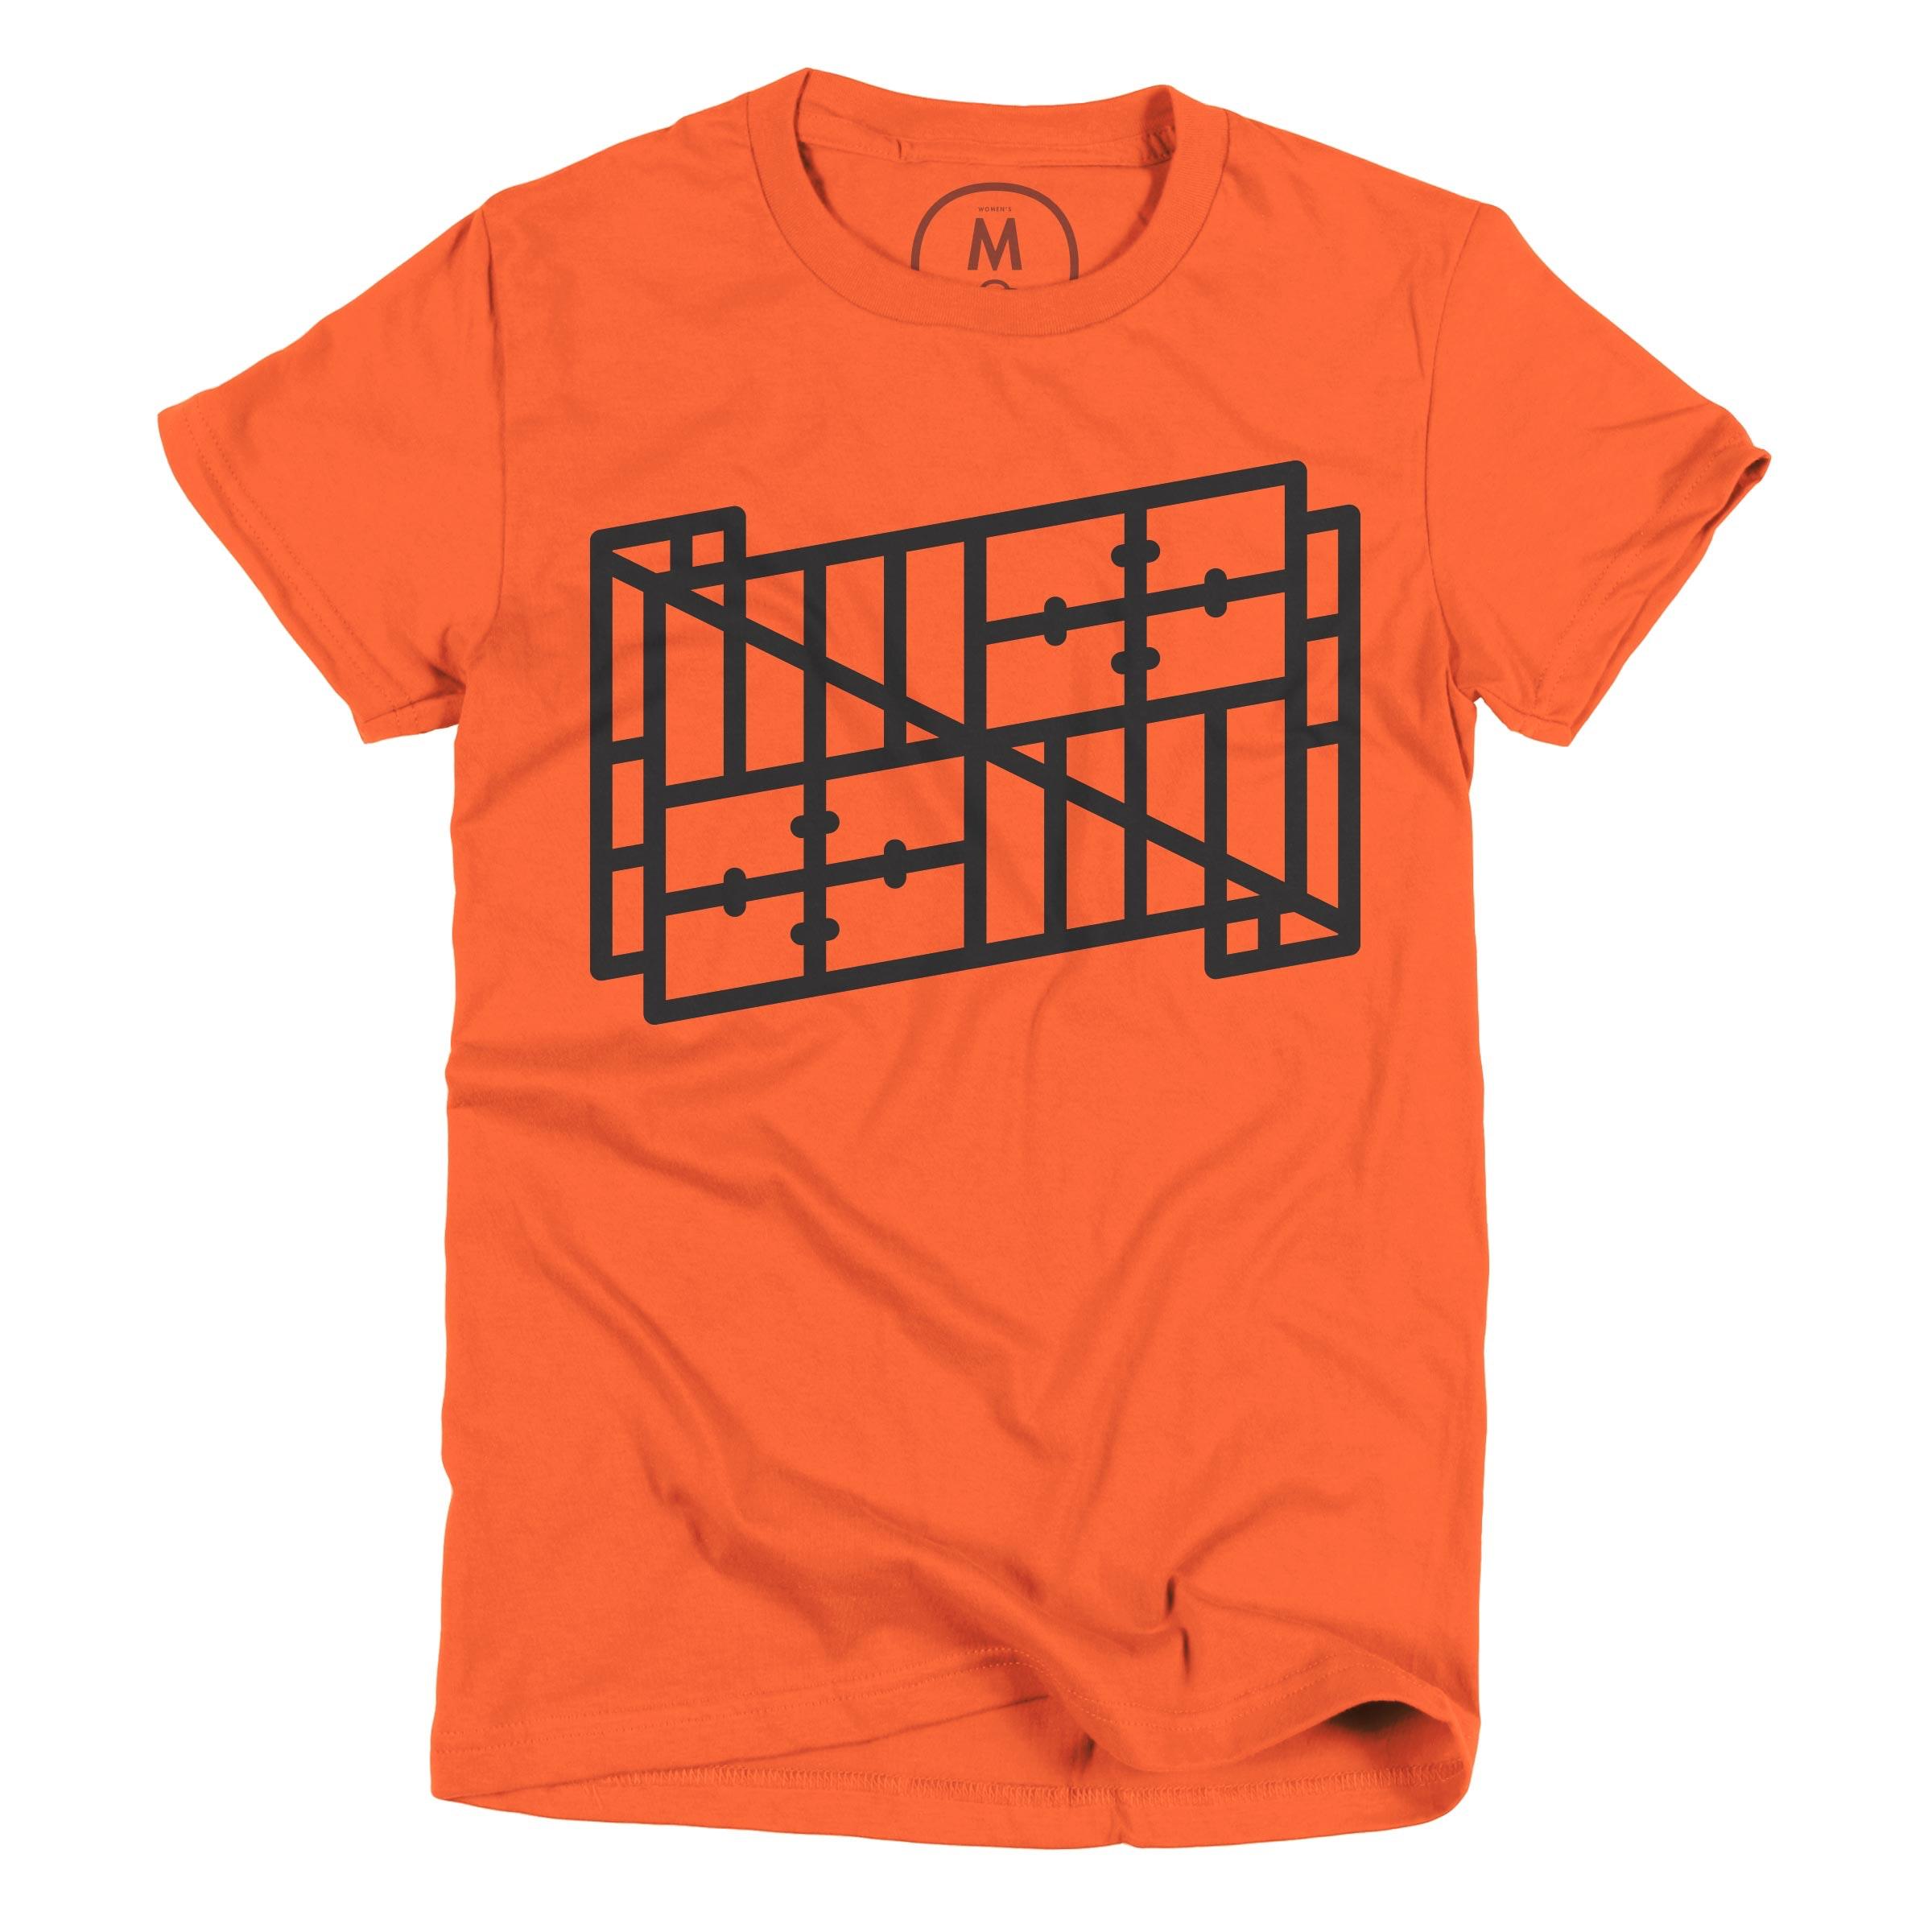 Charming Orange (Women's)